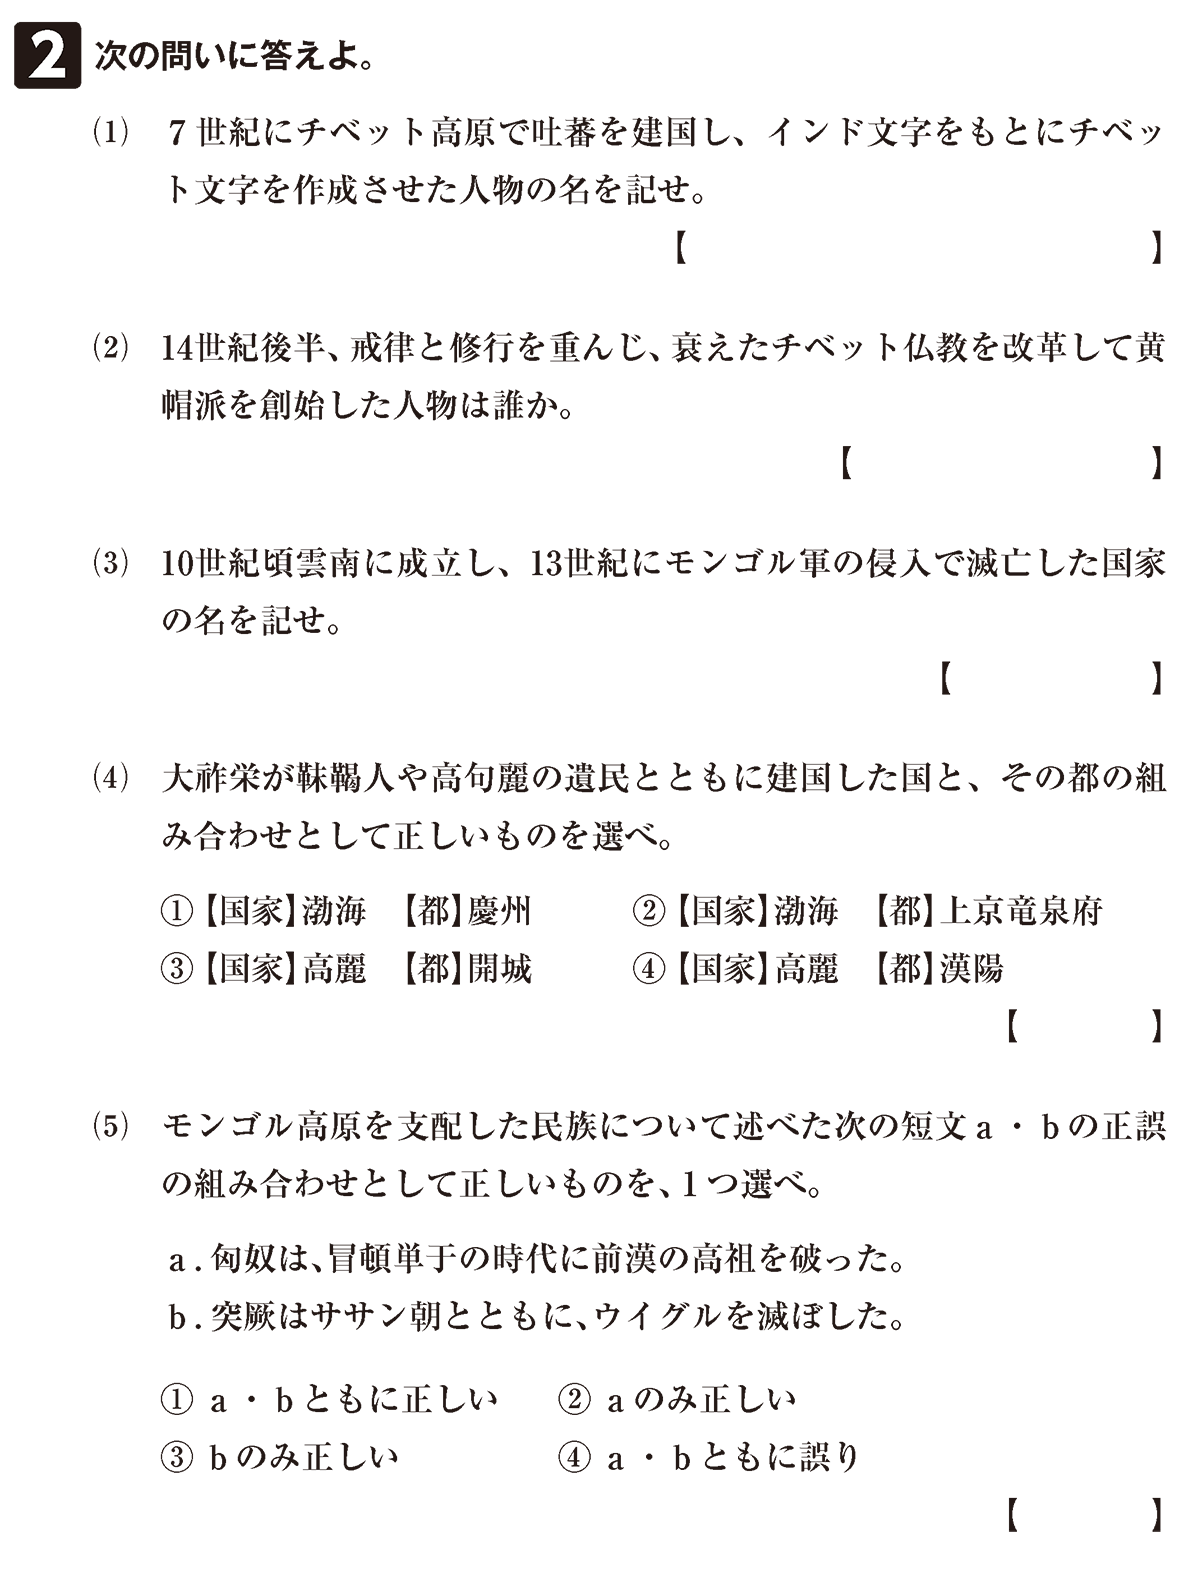 高校世界史 明・清の時代6 確認テスト(後半)問題2